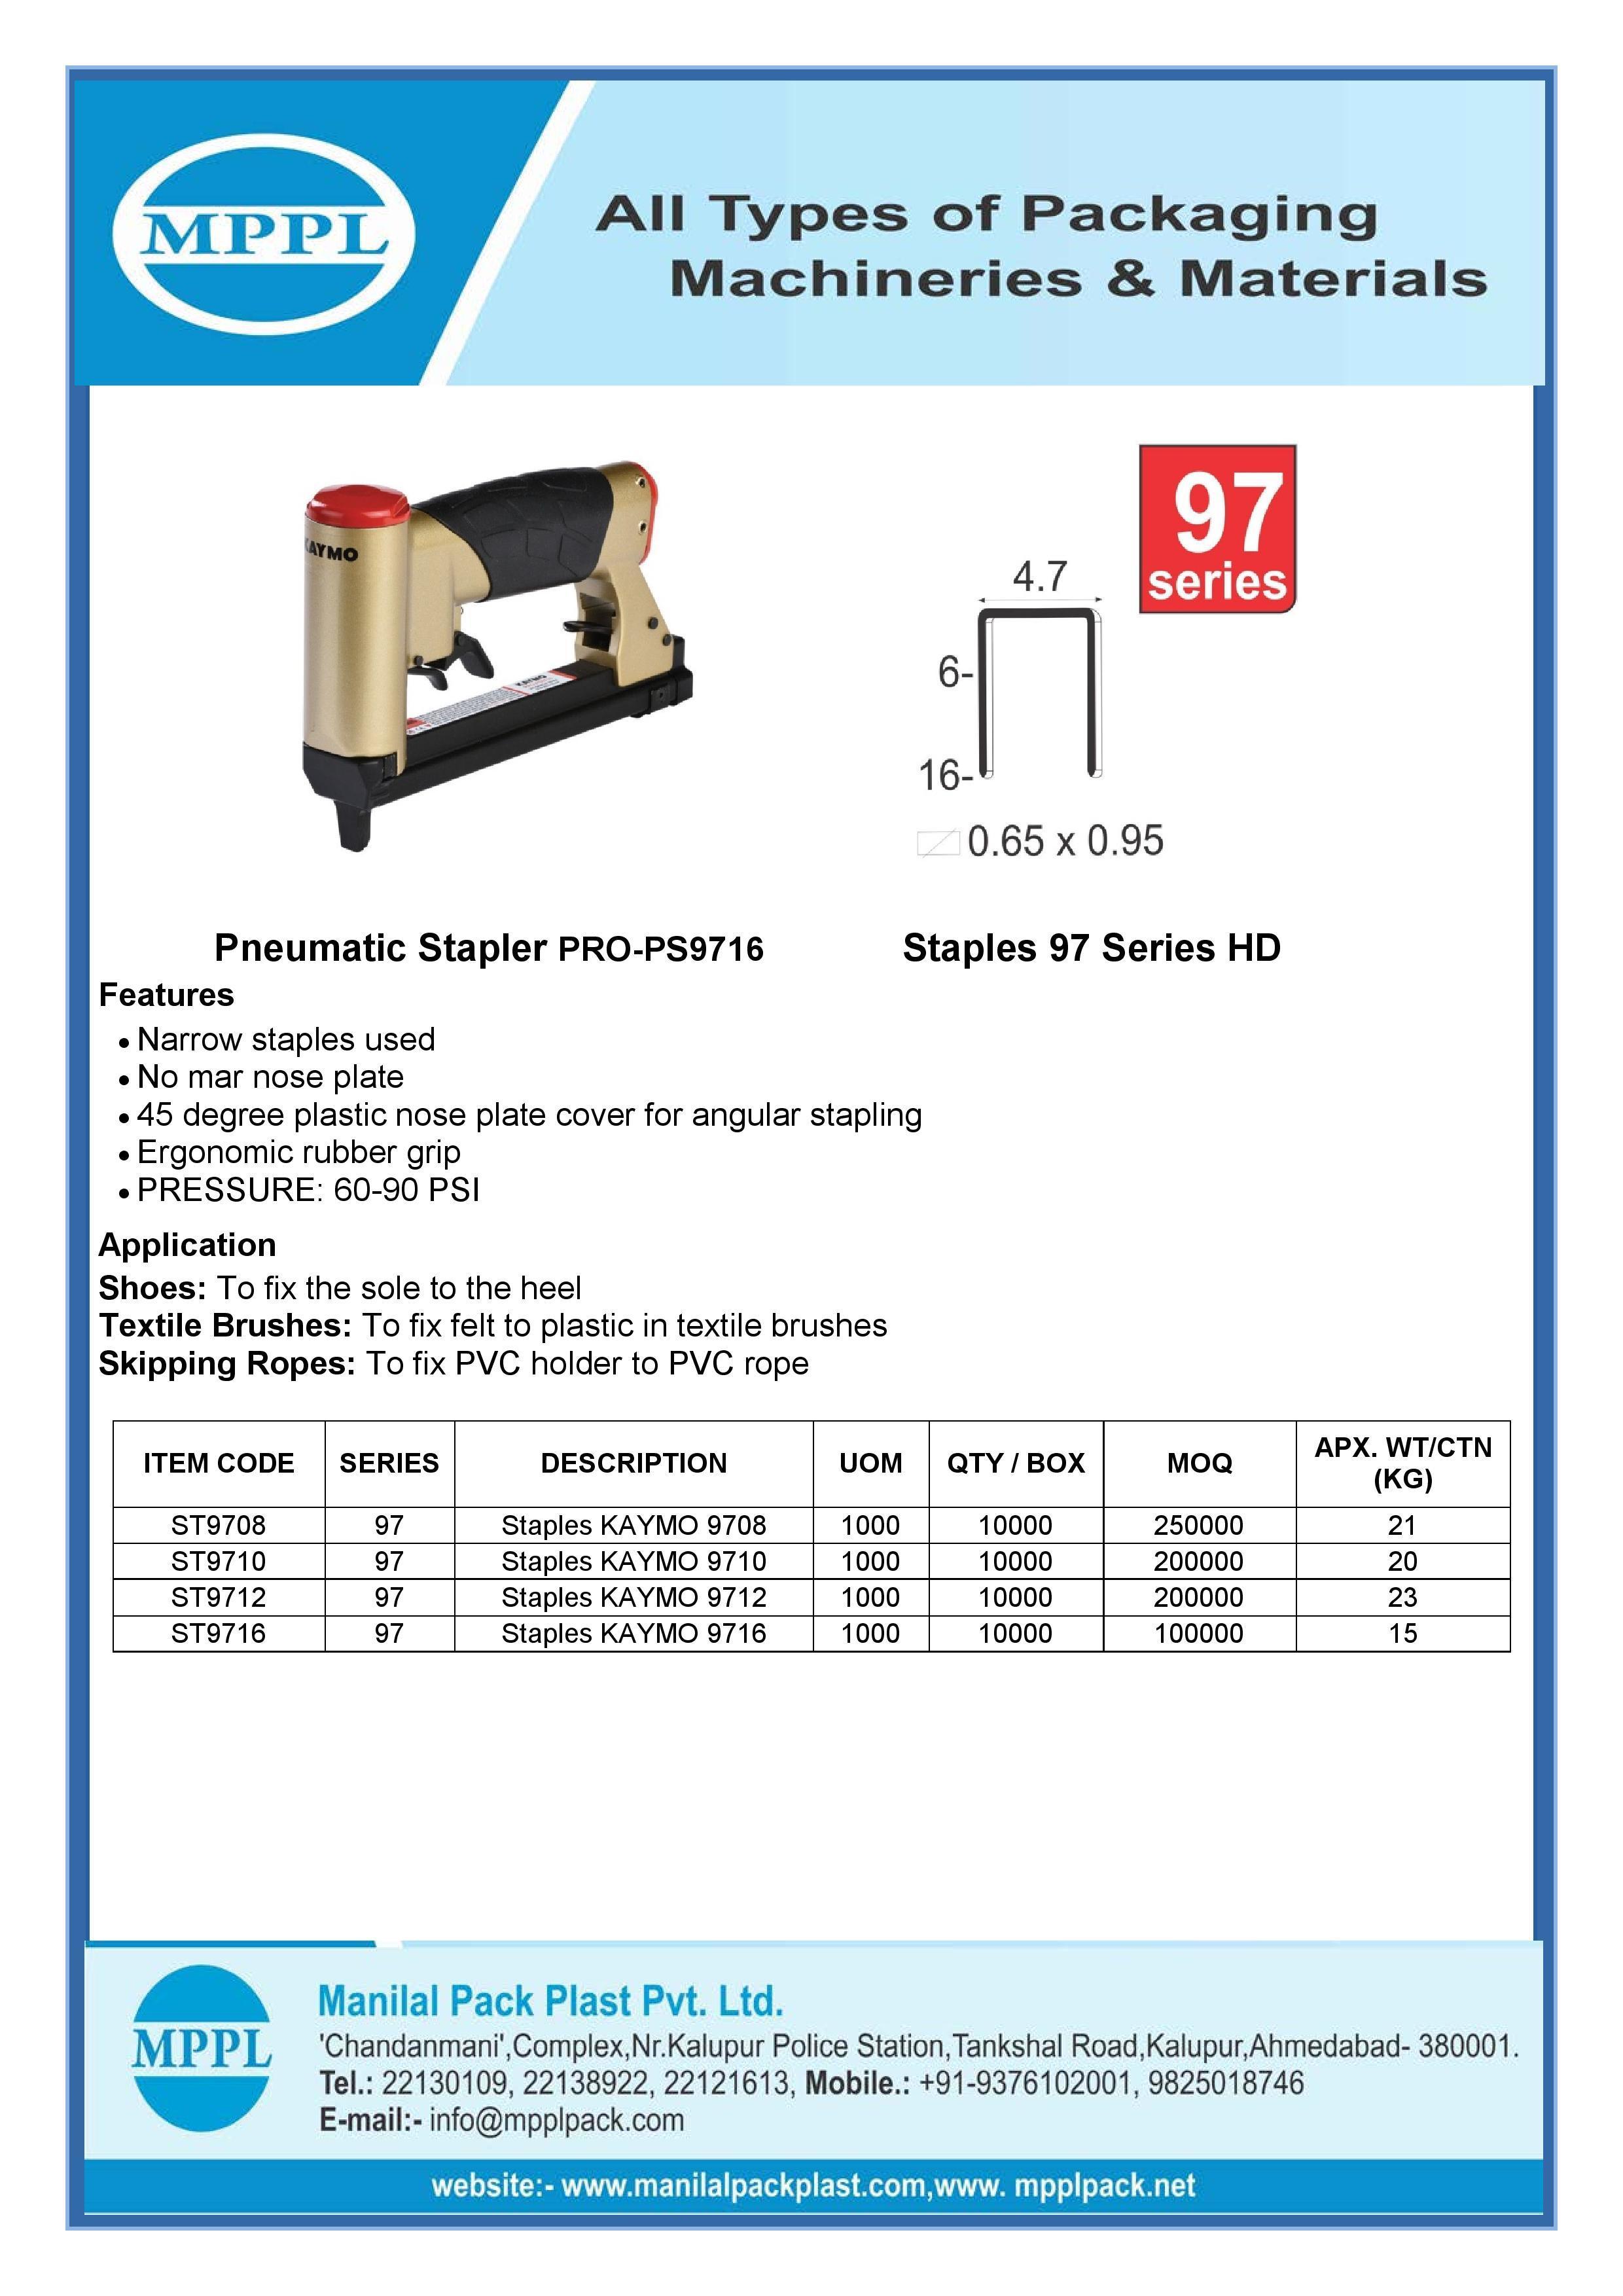 Pneumatic Stapler PRO-PS9716